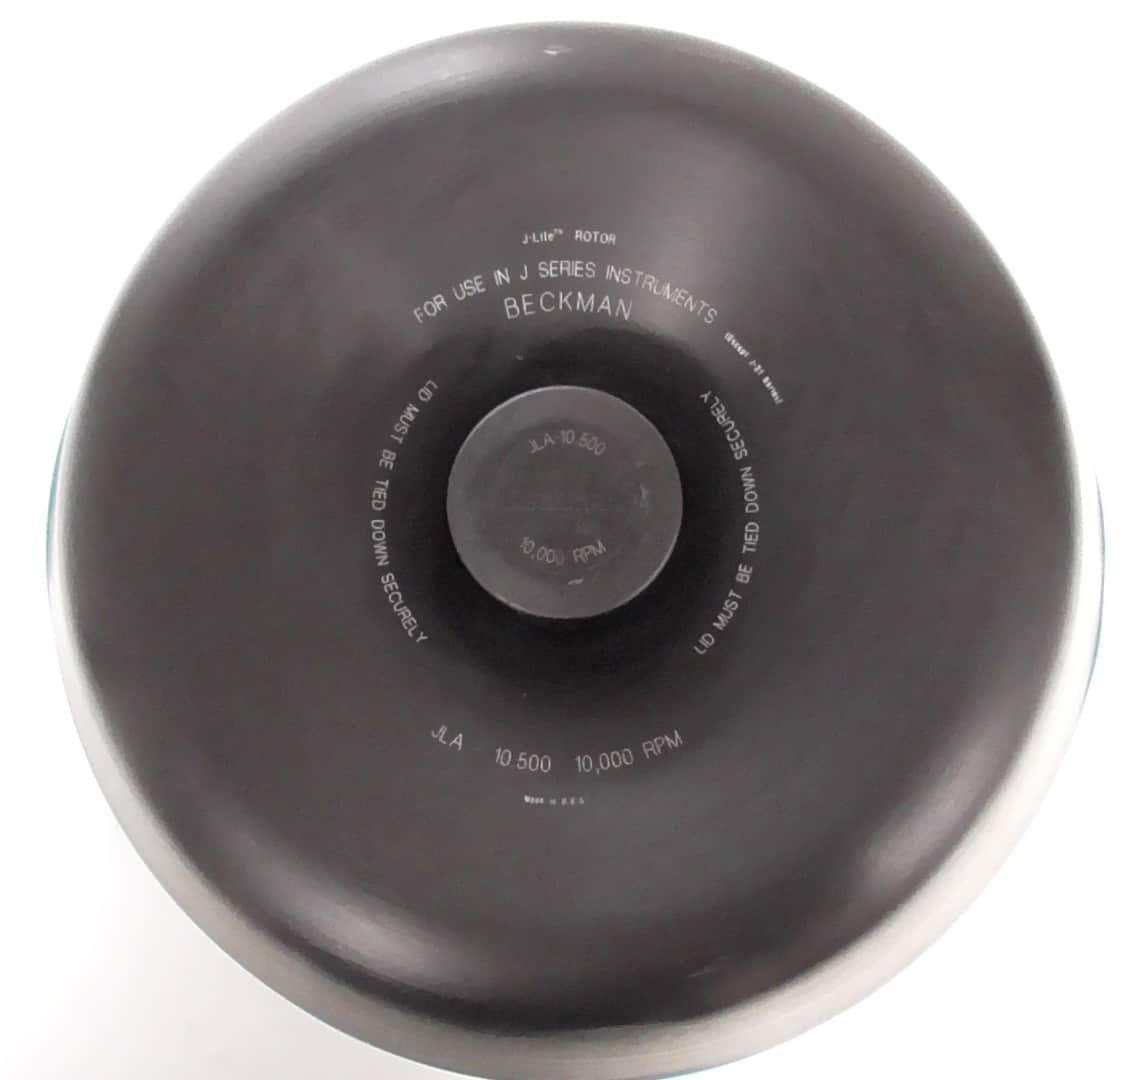 Beckman JLA-10.500 Centrifuge Rotor